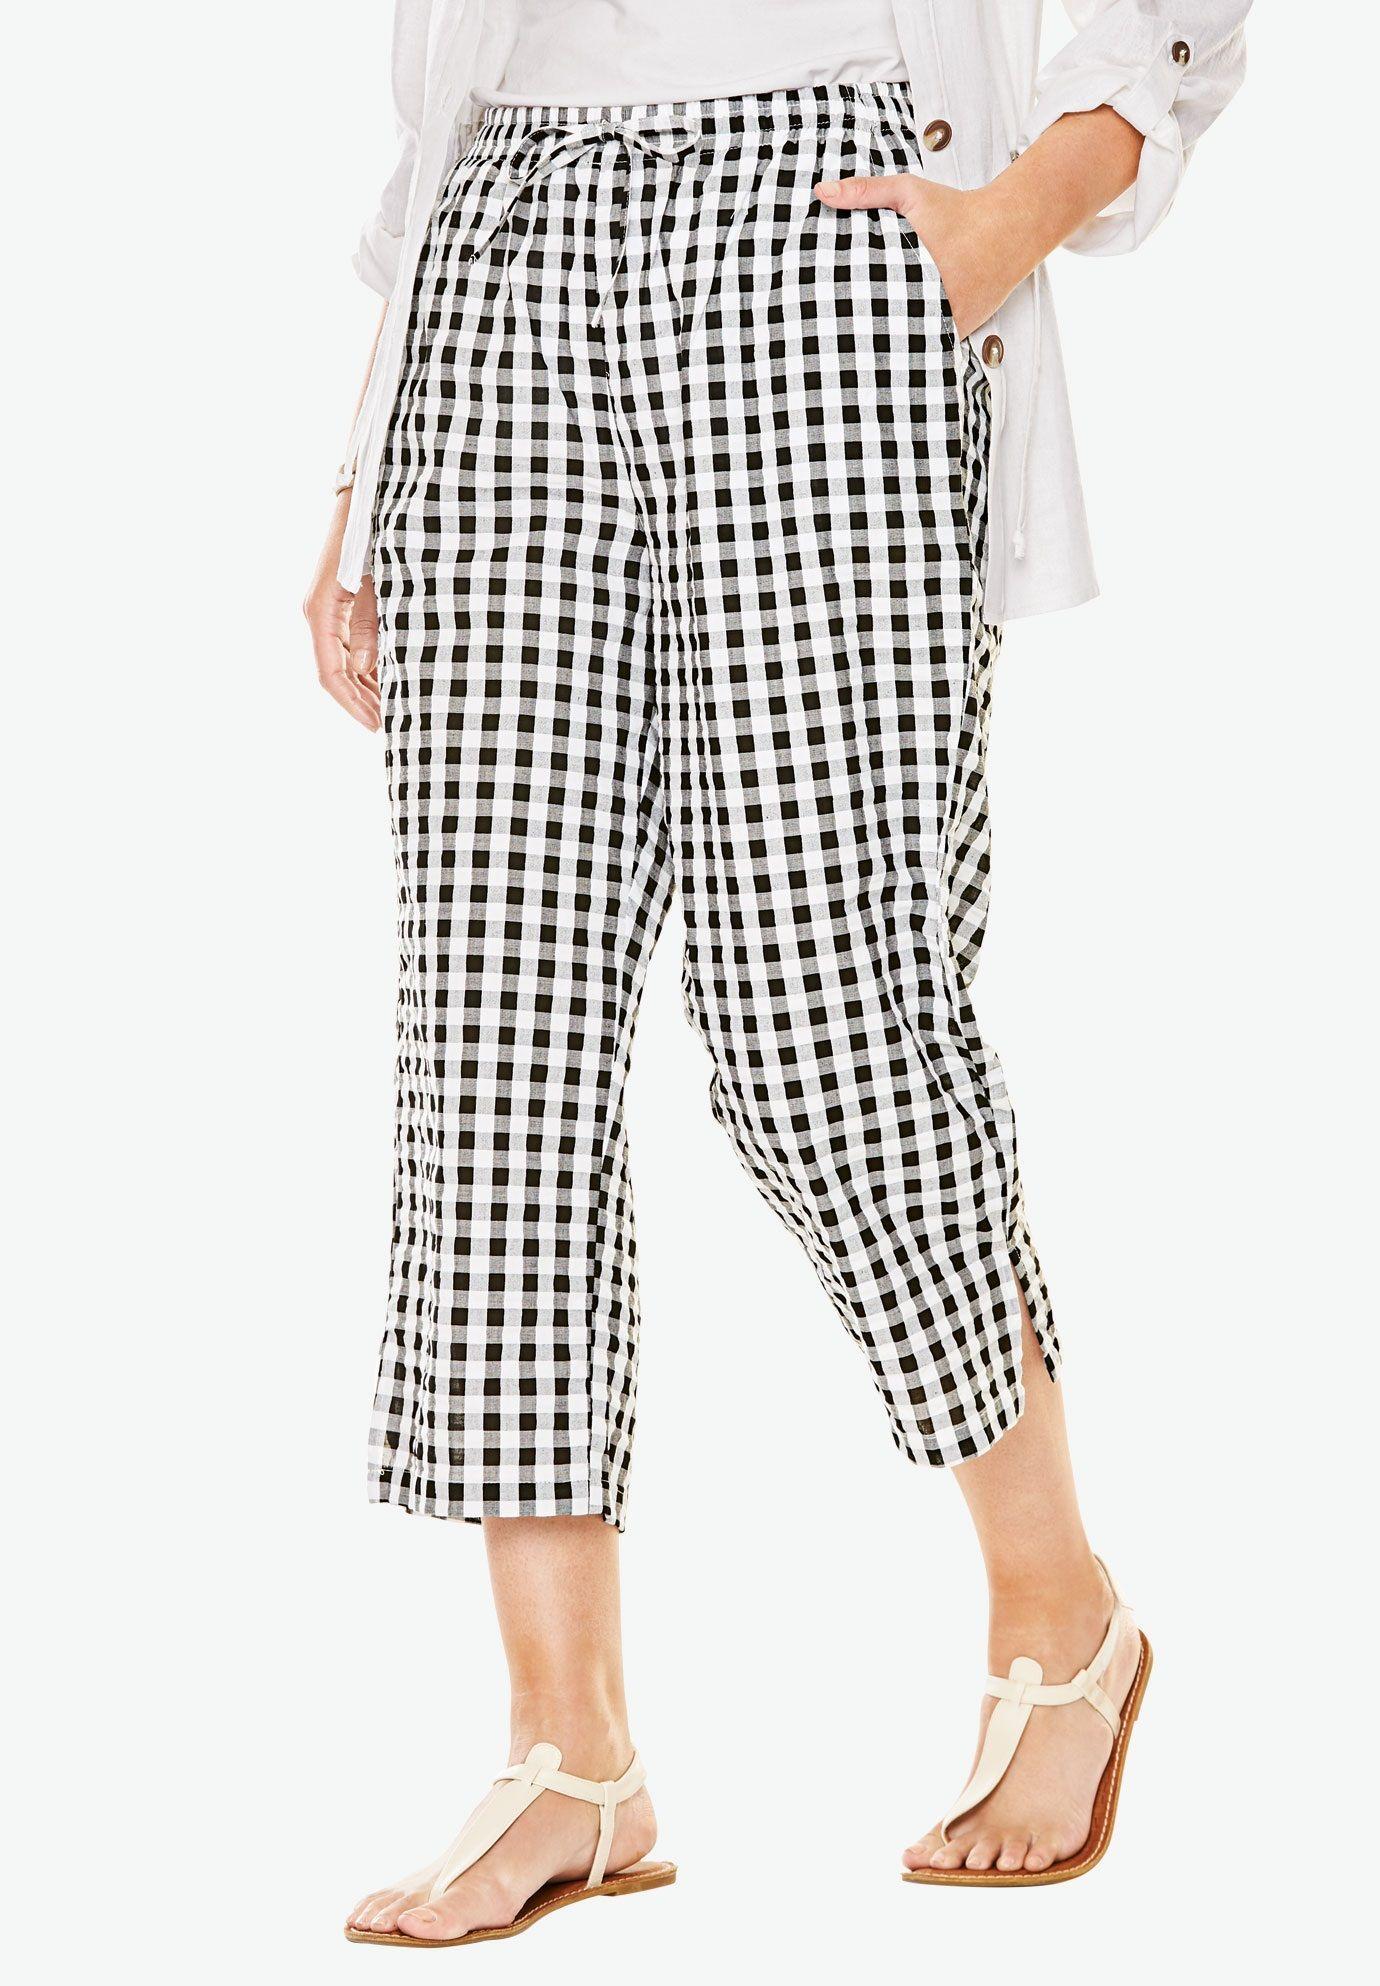 Seersucker Capri Pants Women S Plus Size Clothing Pants For